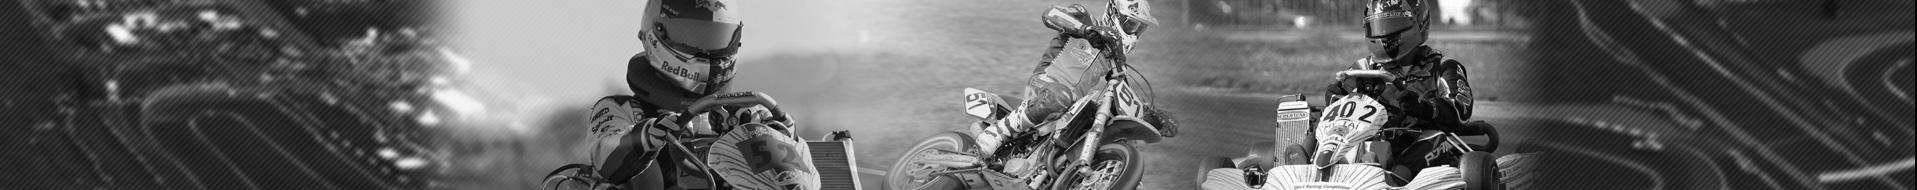 Circuit de la Vallée, Karting, moto, conduite sécurisée auto